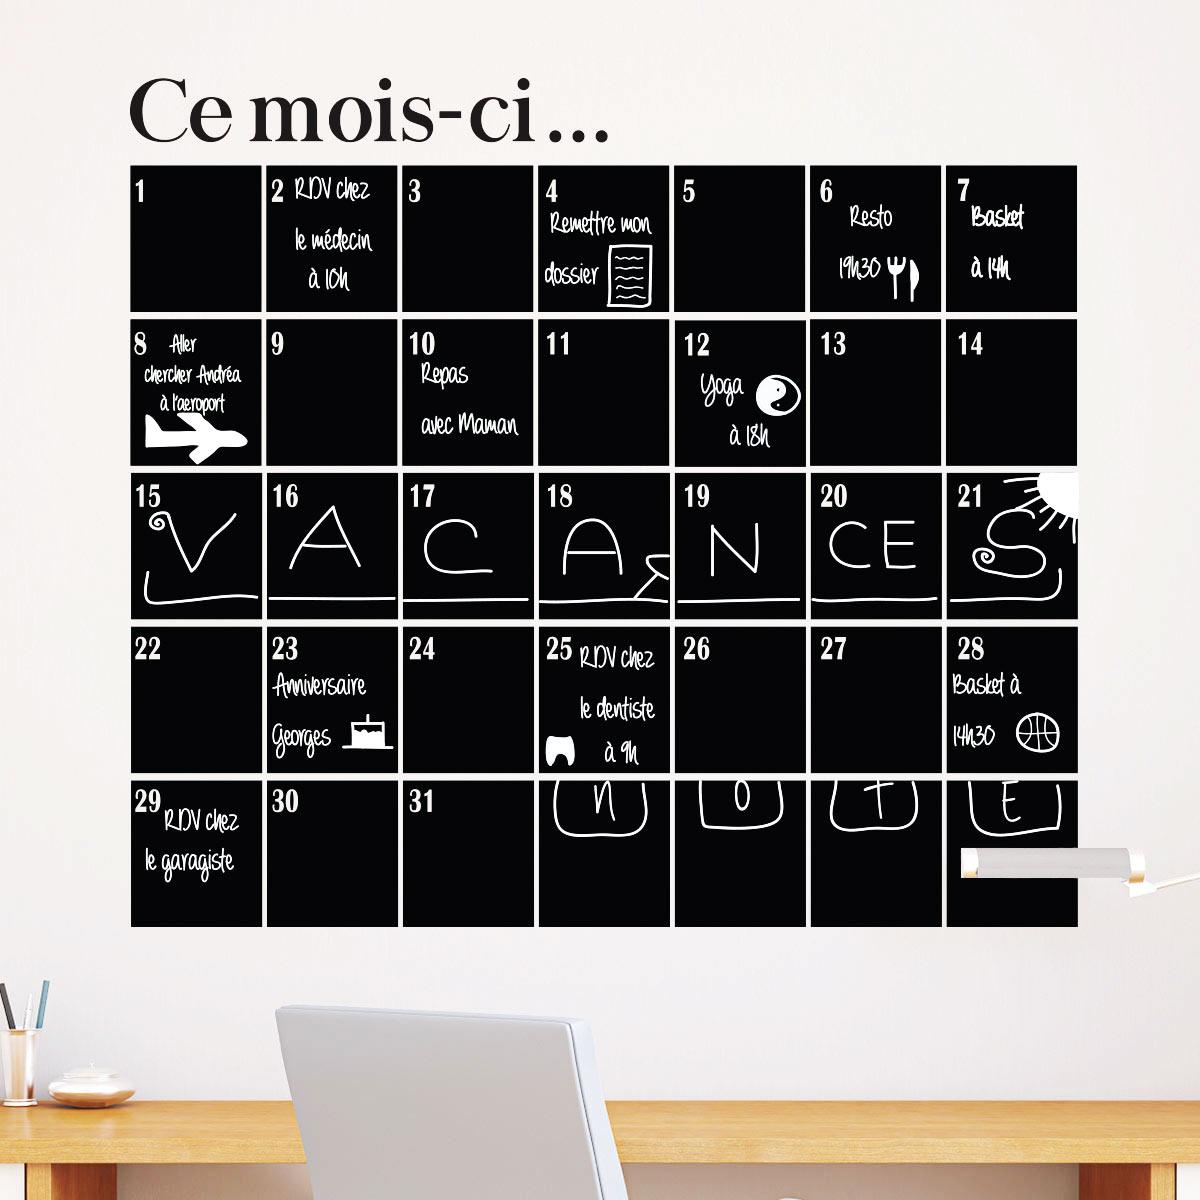 sticker ardoise calendrier mensuel cuisine ardoise ambiance sticker. Black Bedroom Furniture Sets. Home Design Ideas